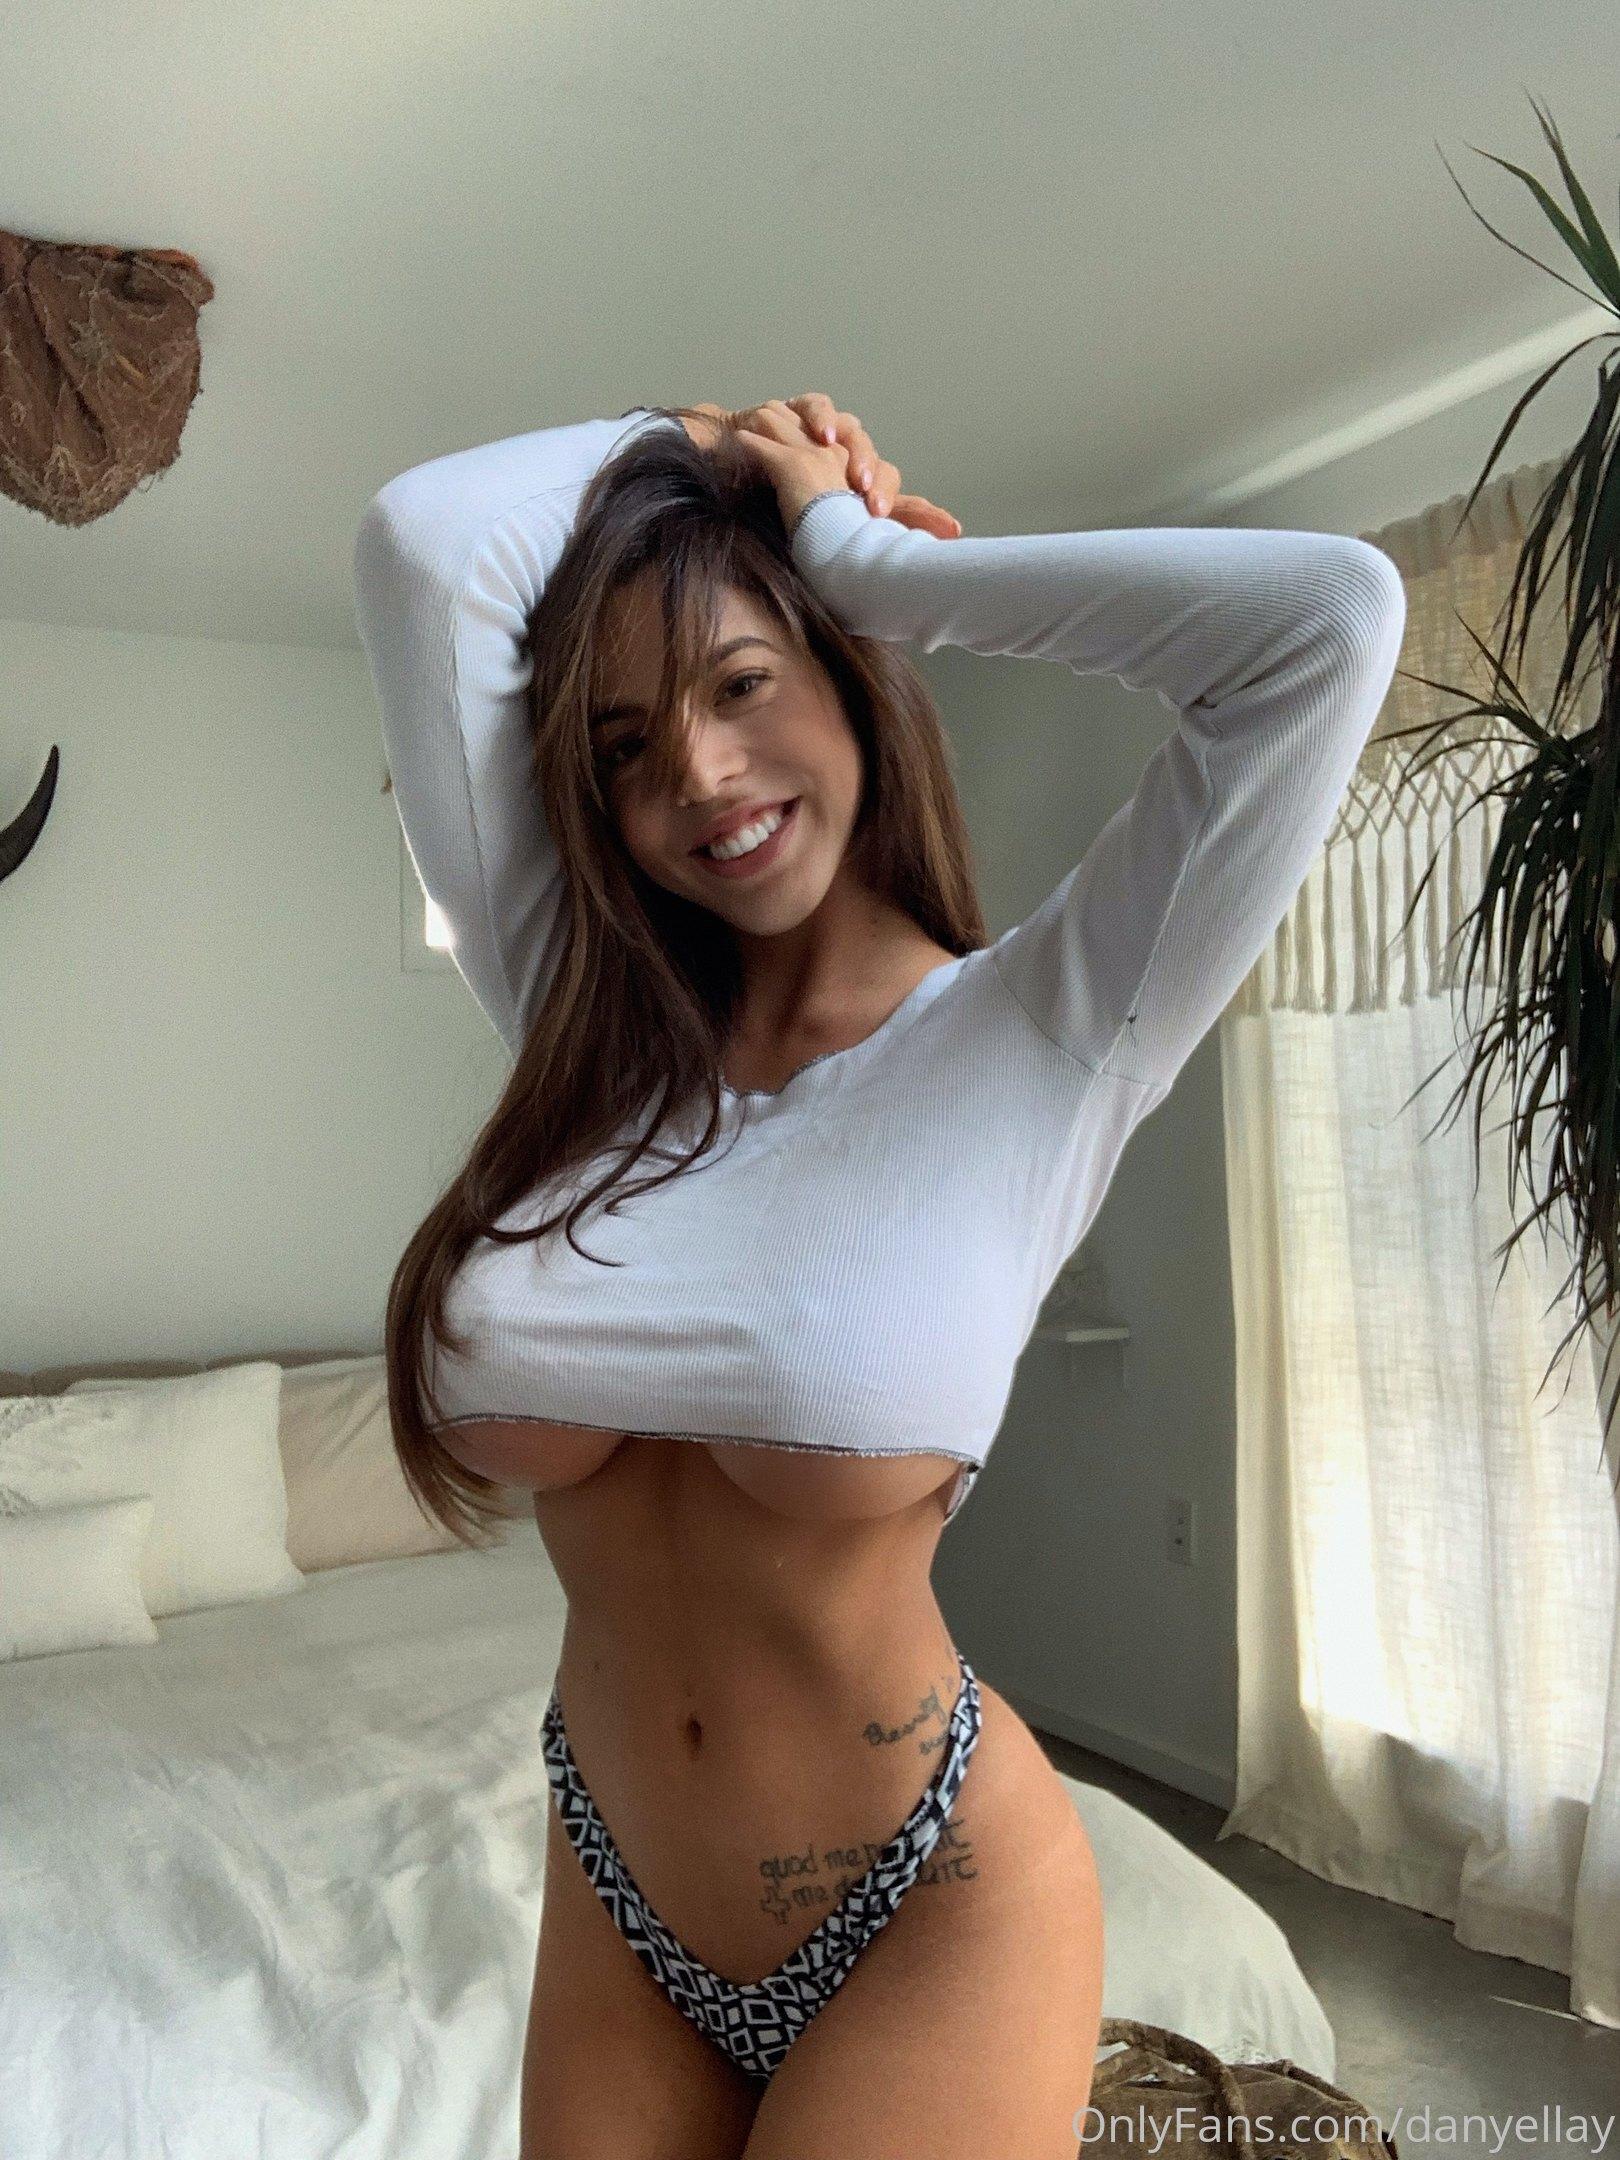 Danielley Ayala 0262